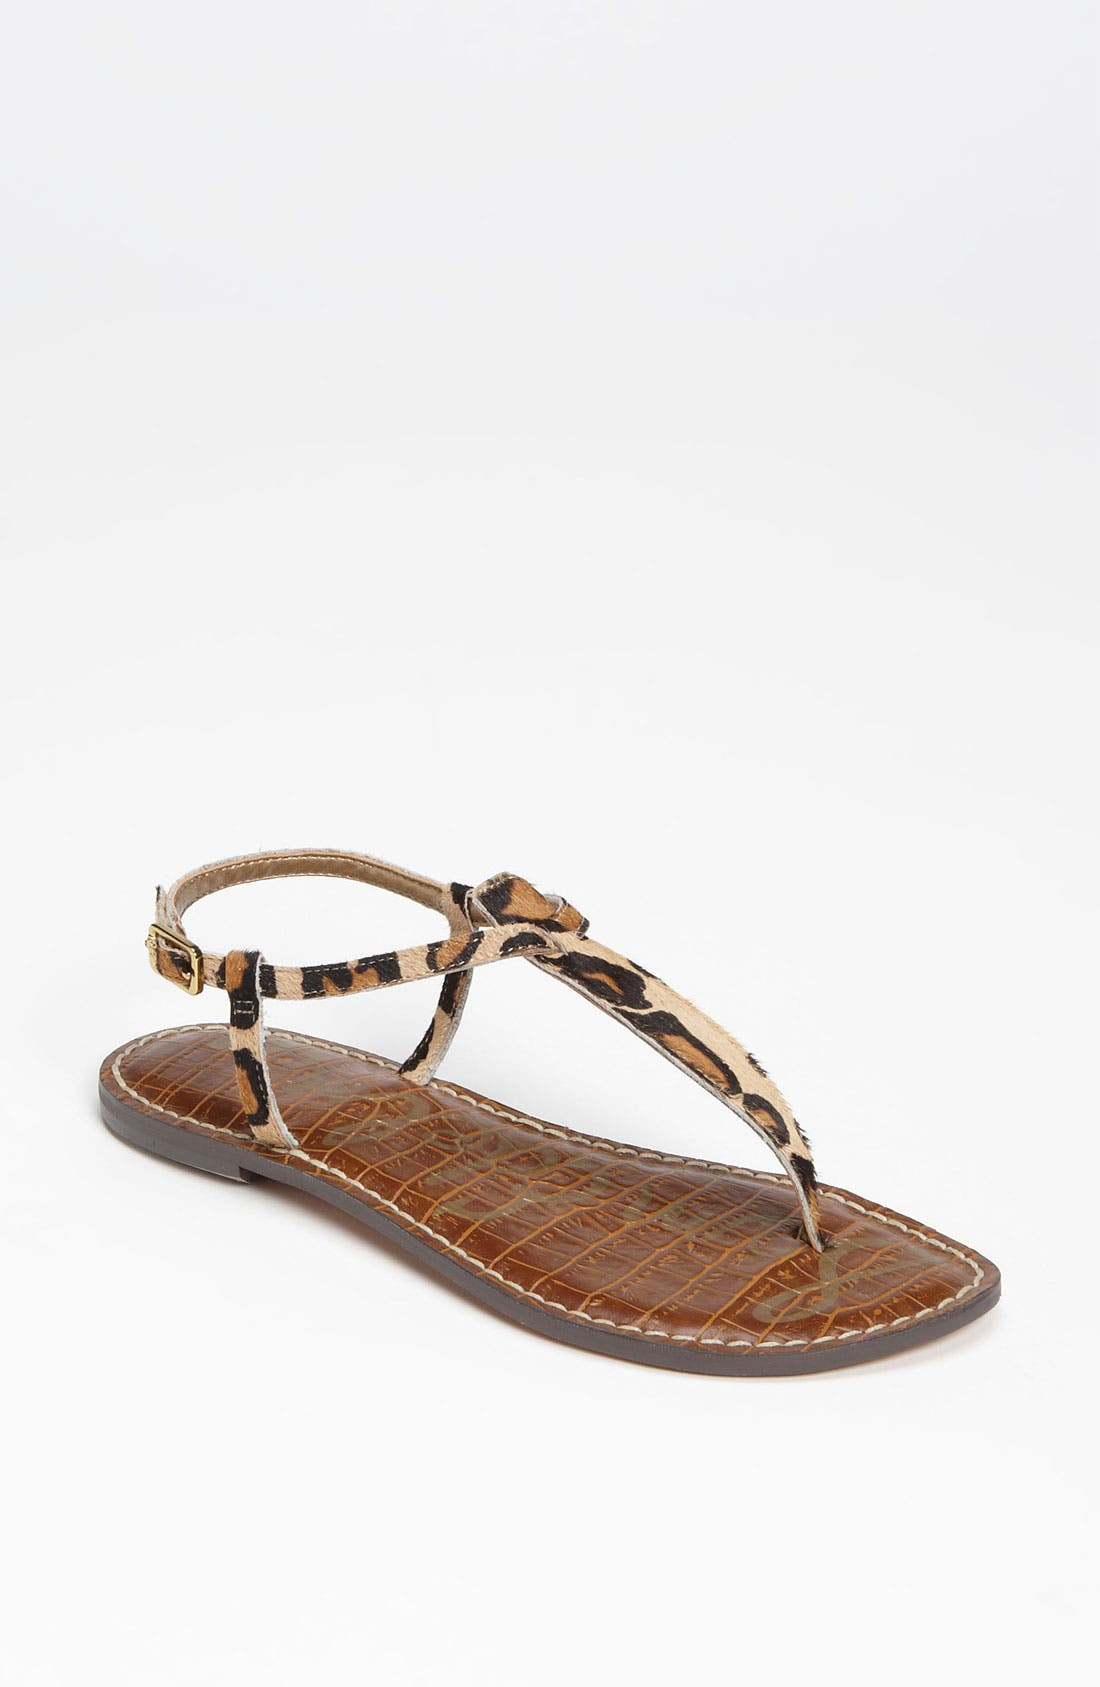 Main Image - Sam Edelman 'Gigi' Sandal (Women)